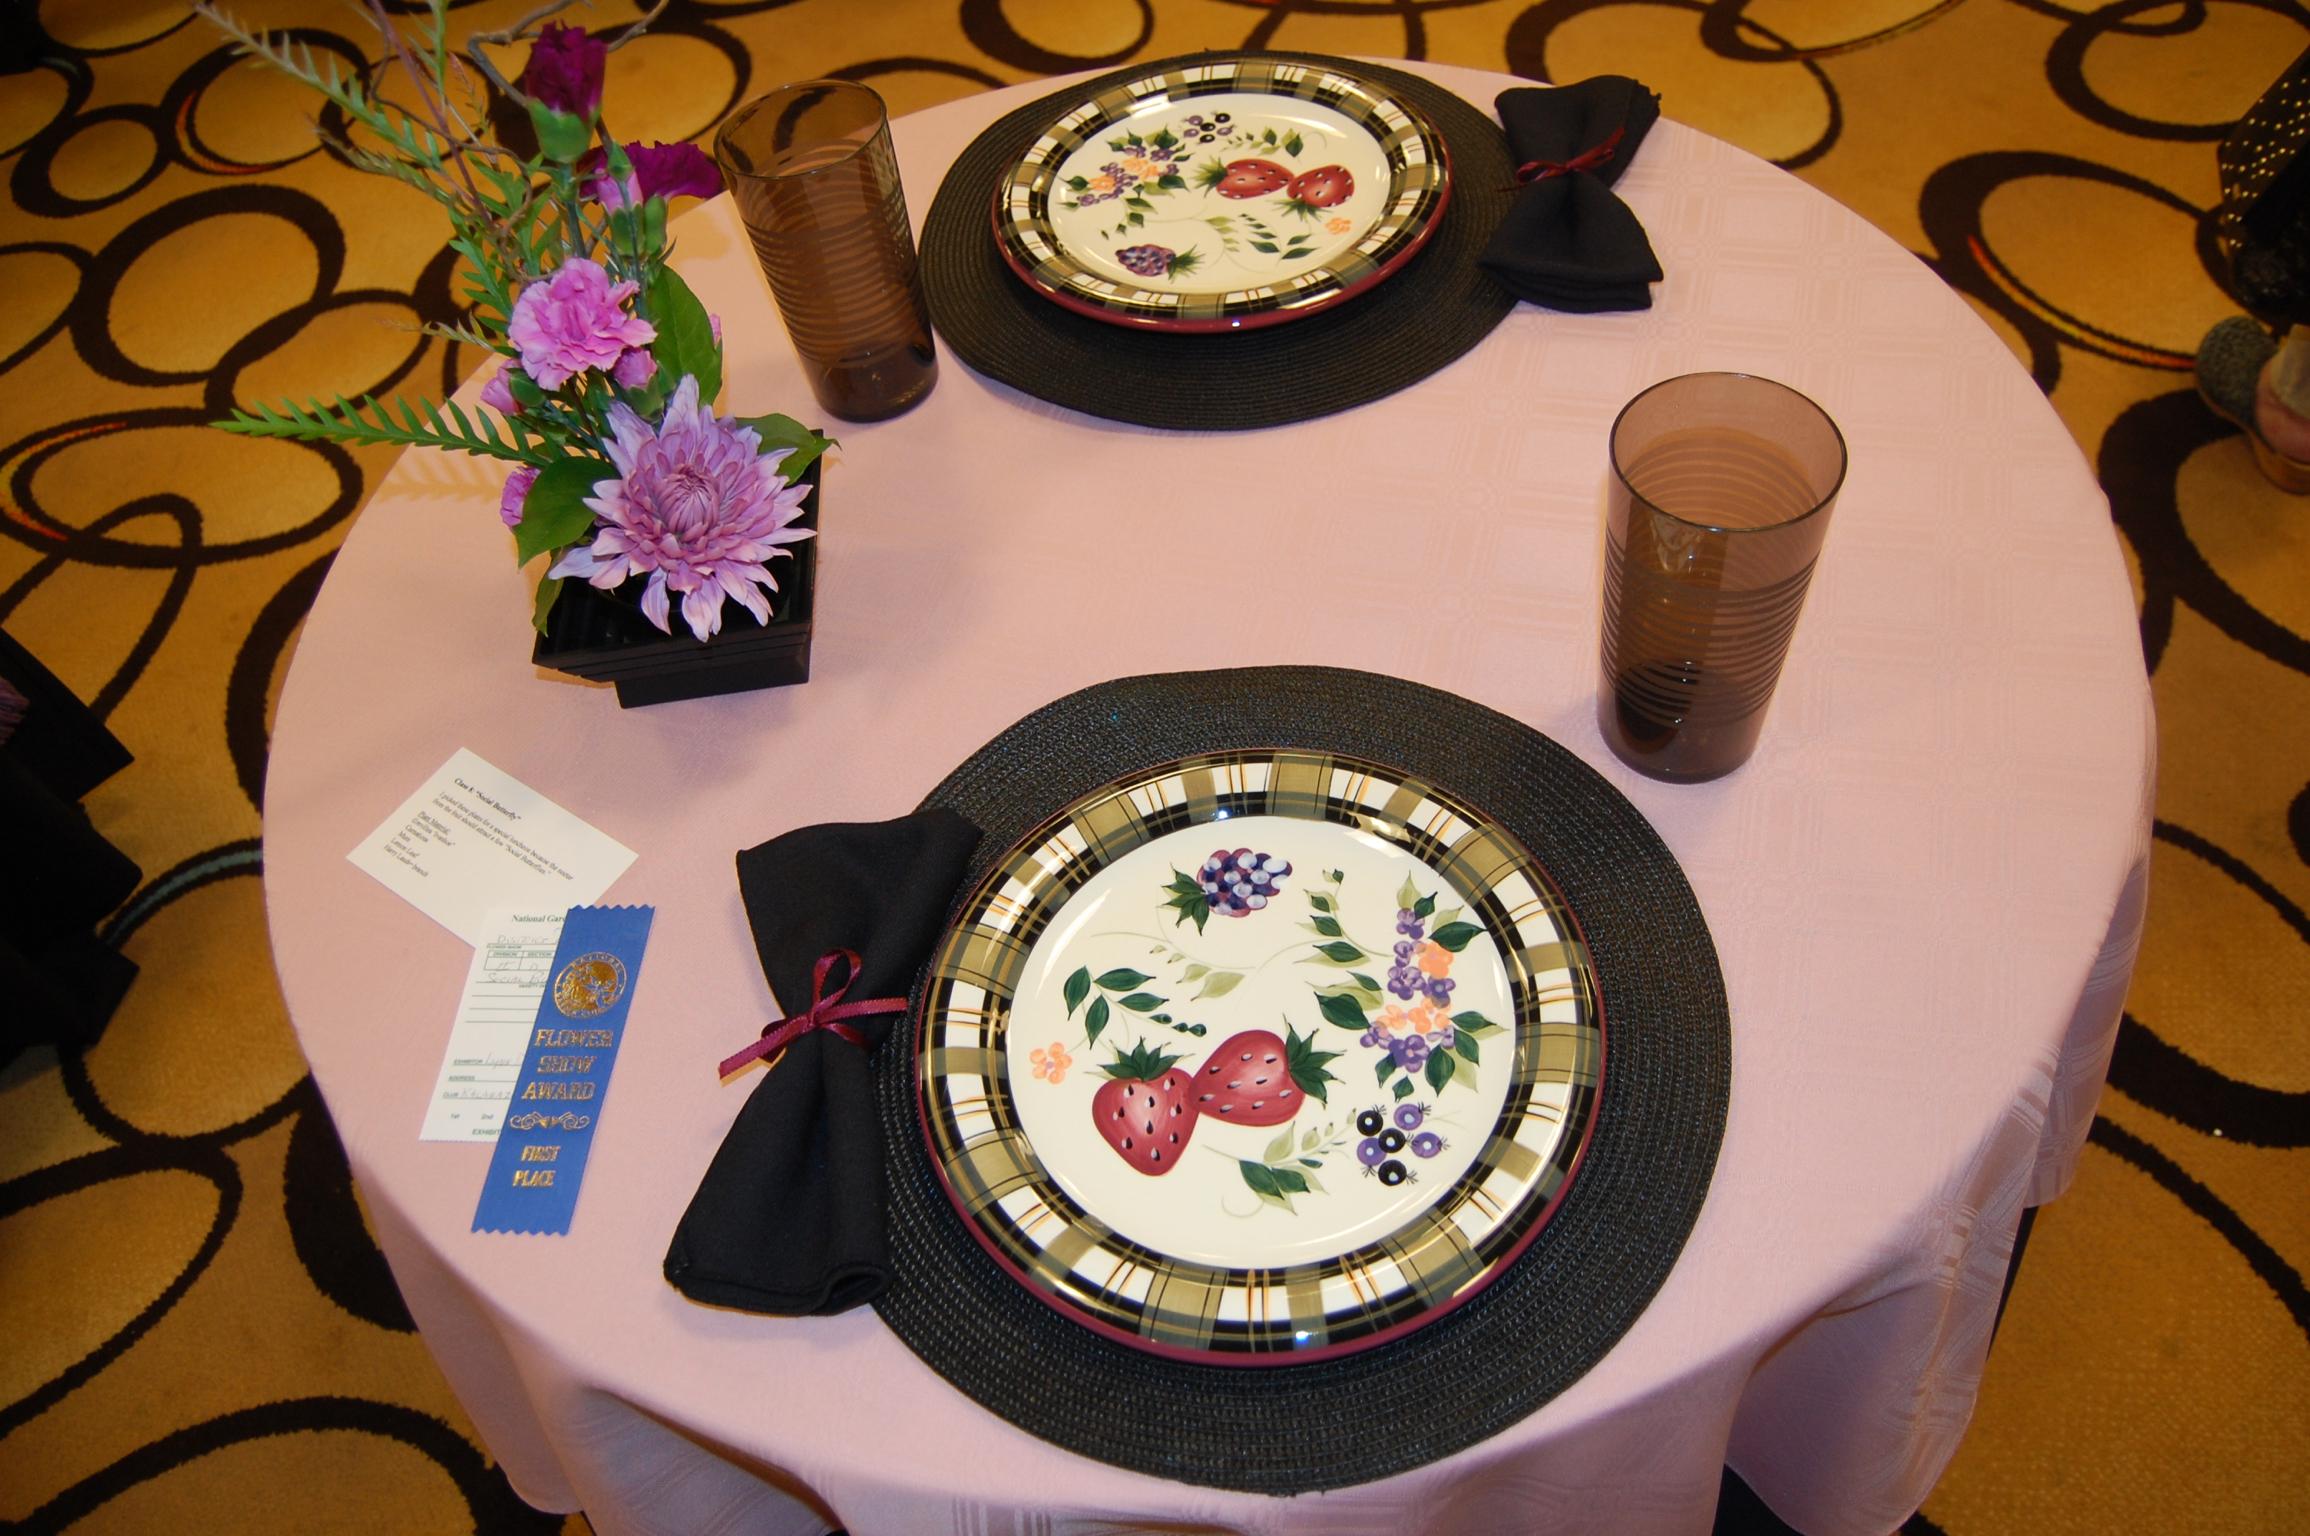 Michigan Garden Club, Inc. Conference :: Kalamazoo Garden ... on standard flower show table designs, garden club underwater designs, winning garden club flower designs,